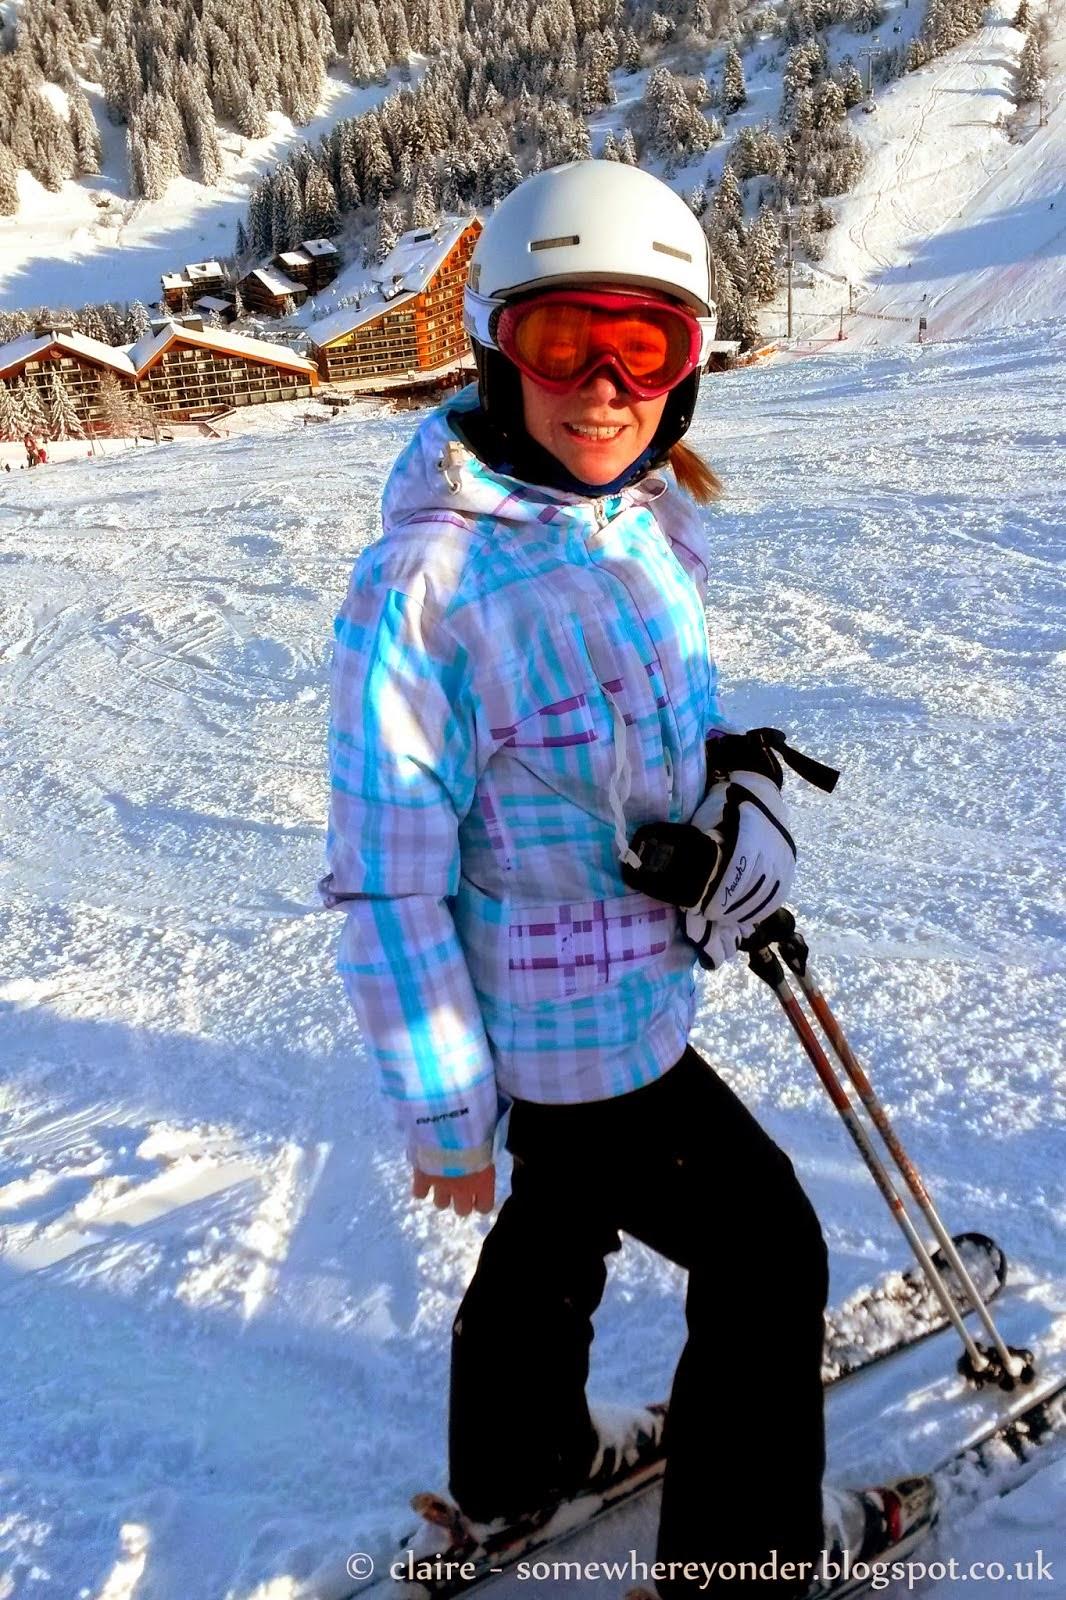 on the slopes - Christmas 2013 - Val Thorens, France